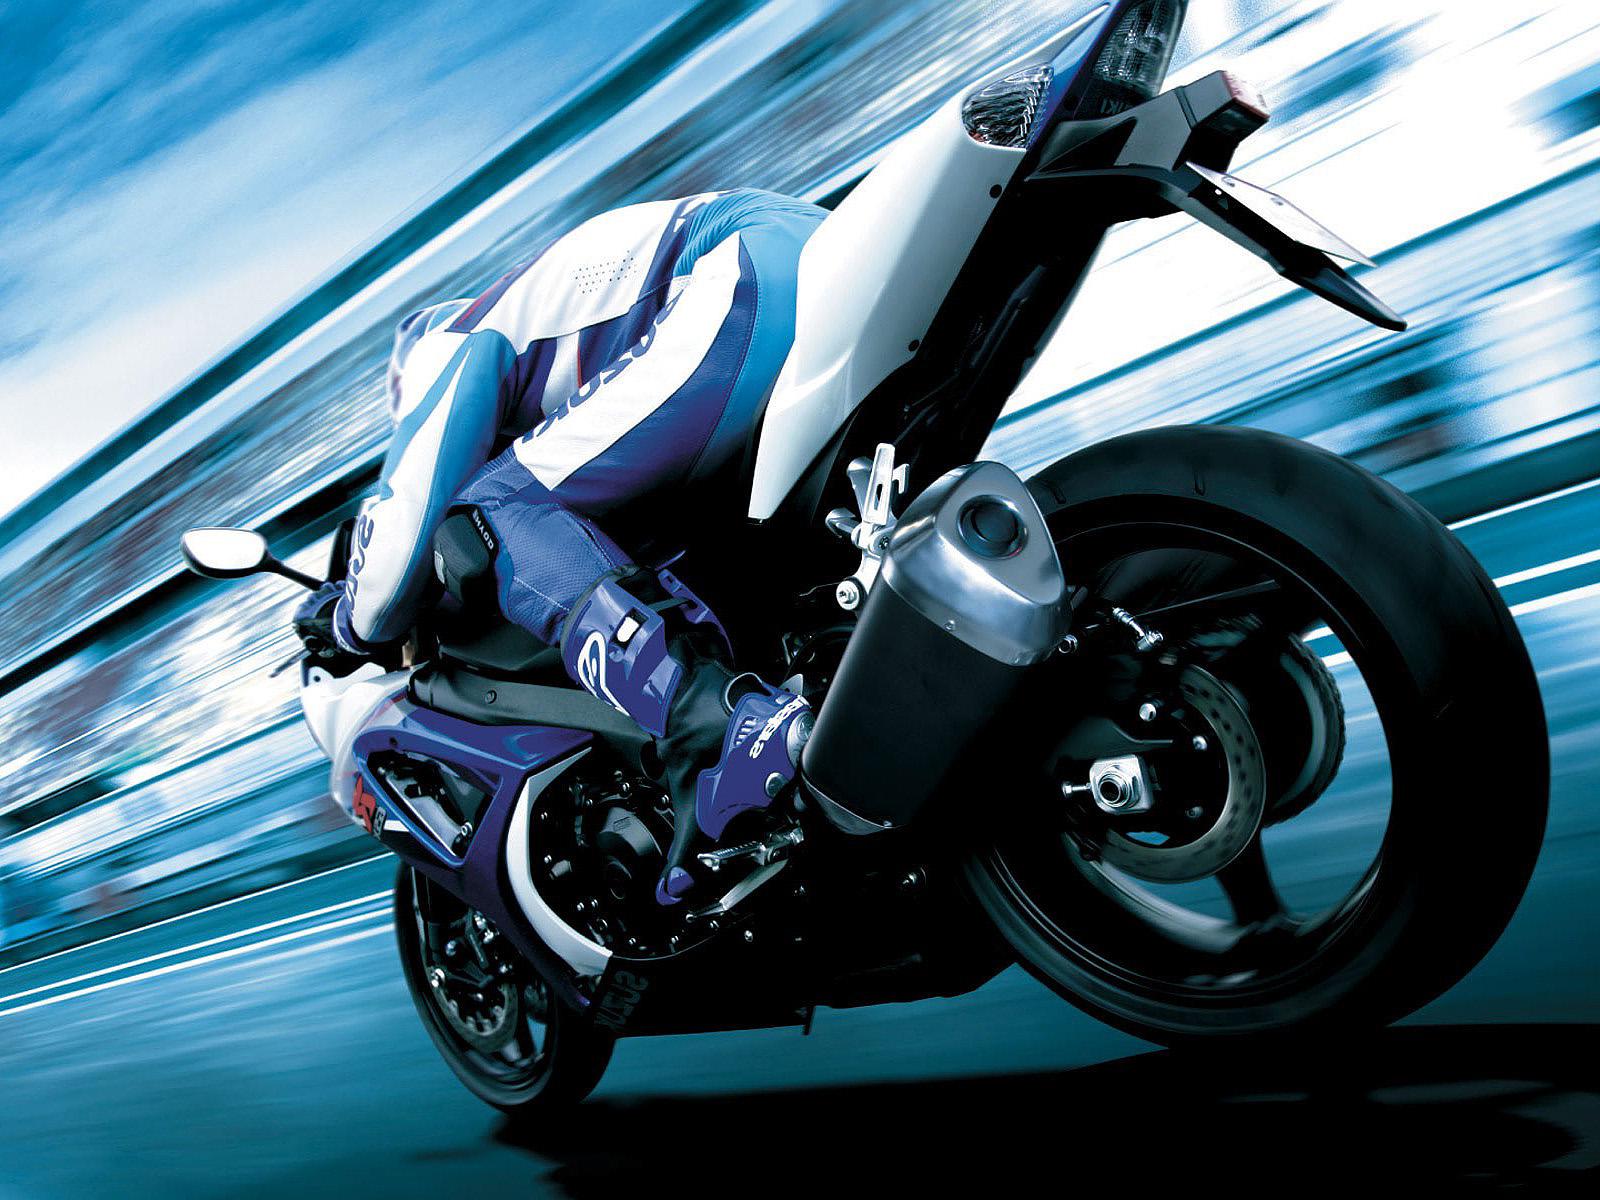 Top Desktop Motorcycles Wallpapers Hd Beautiful Motorcycle Wallpaper